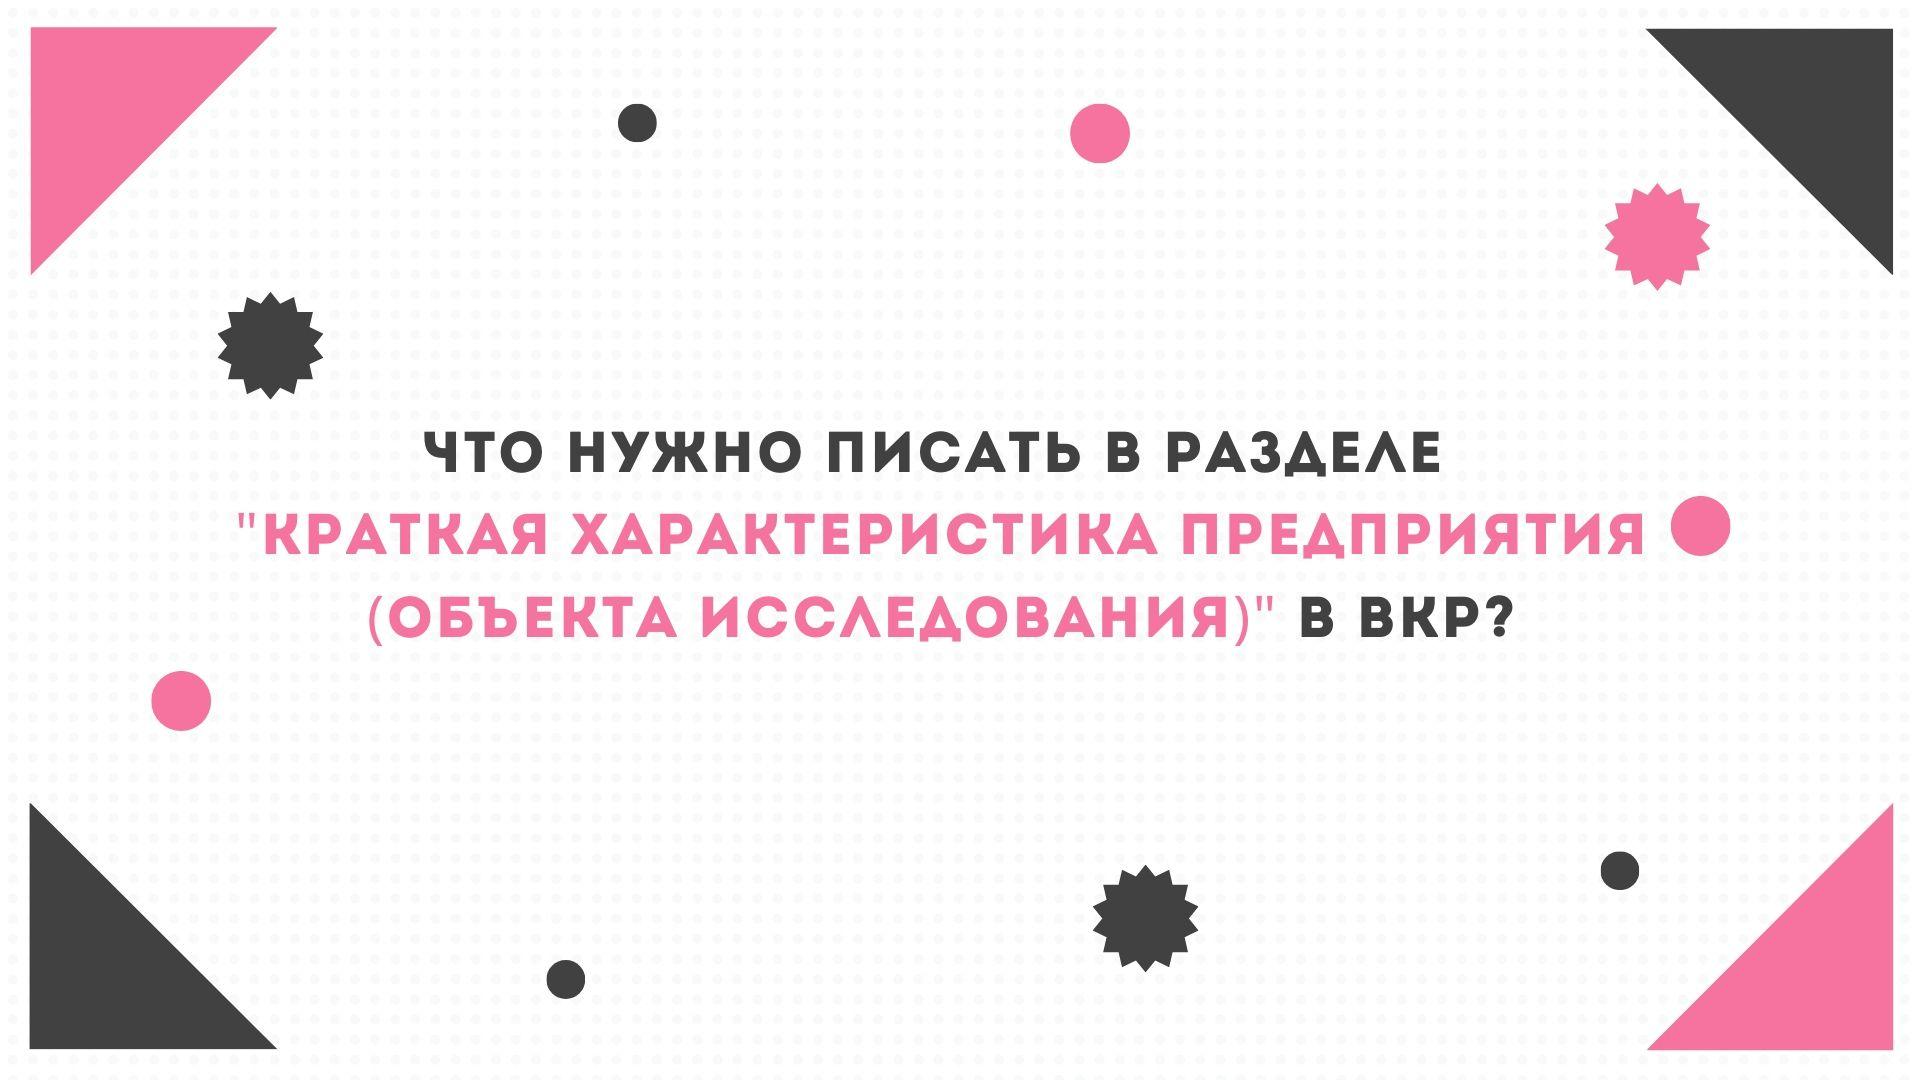 "Что нужно писать в разделе ""Краткая характеристика предприятия (объекта исследования)"" в ВКР?"